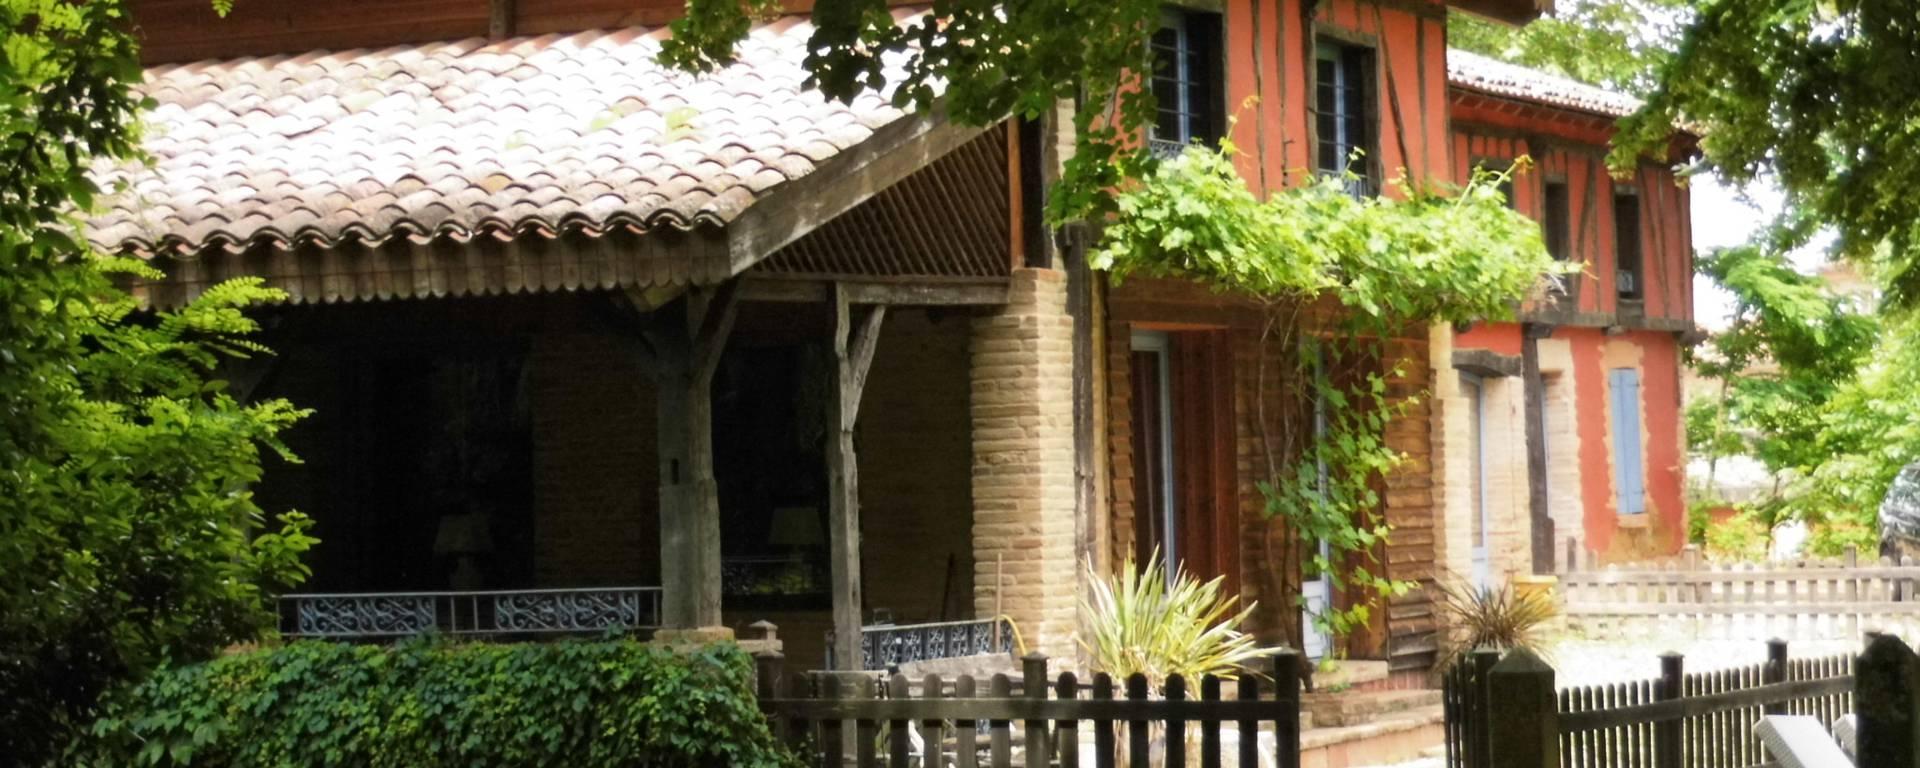 La maison Philippe, Lombez, Savès